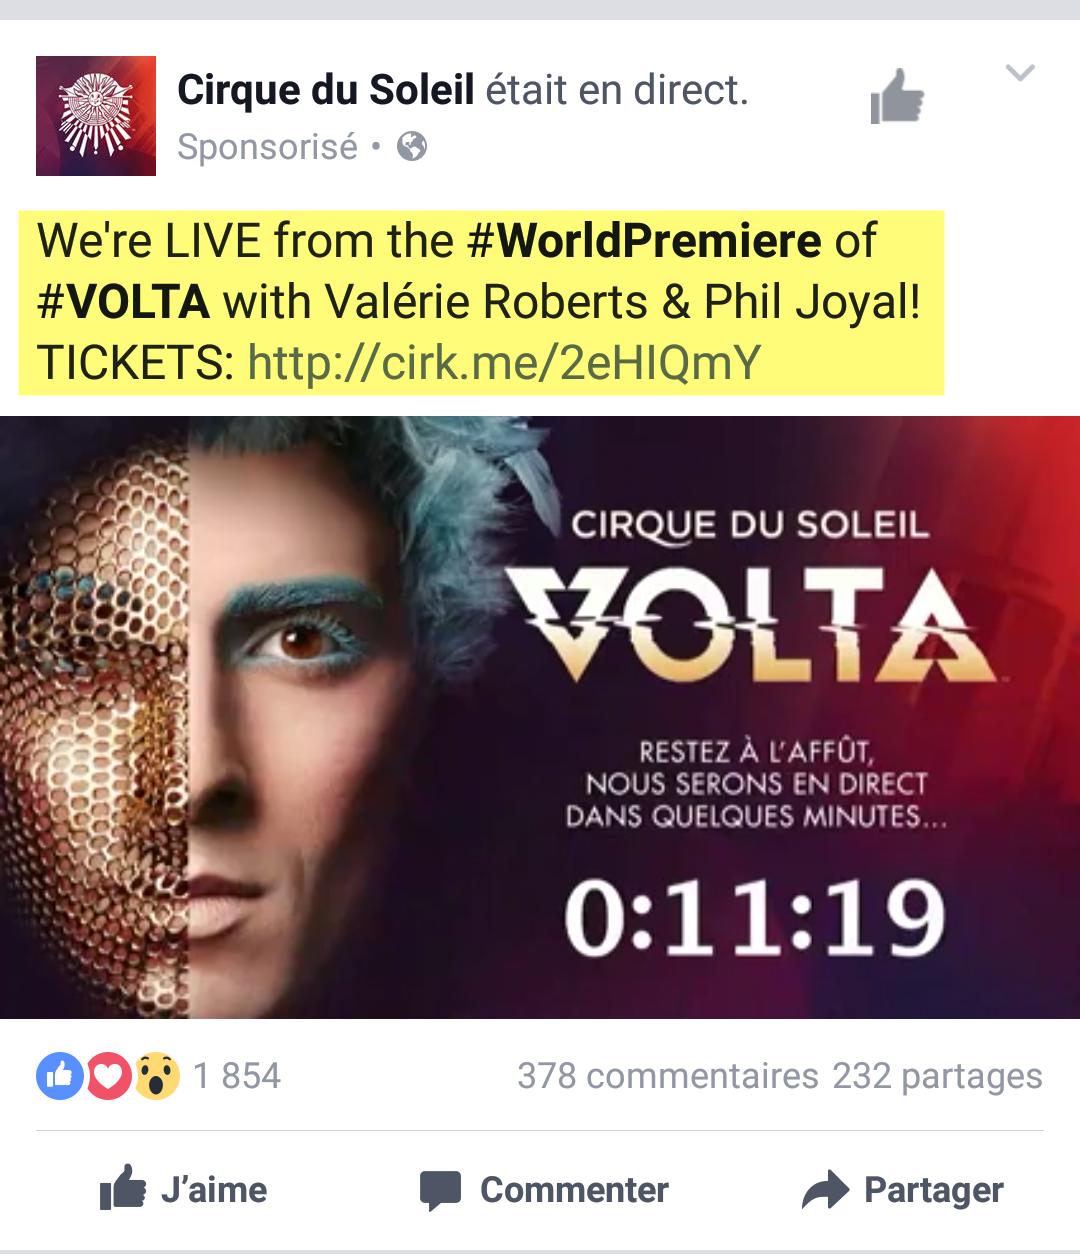 Cirque du Soleil Facebook LIve for Volta